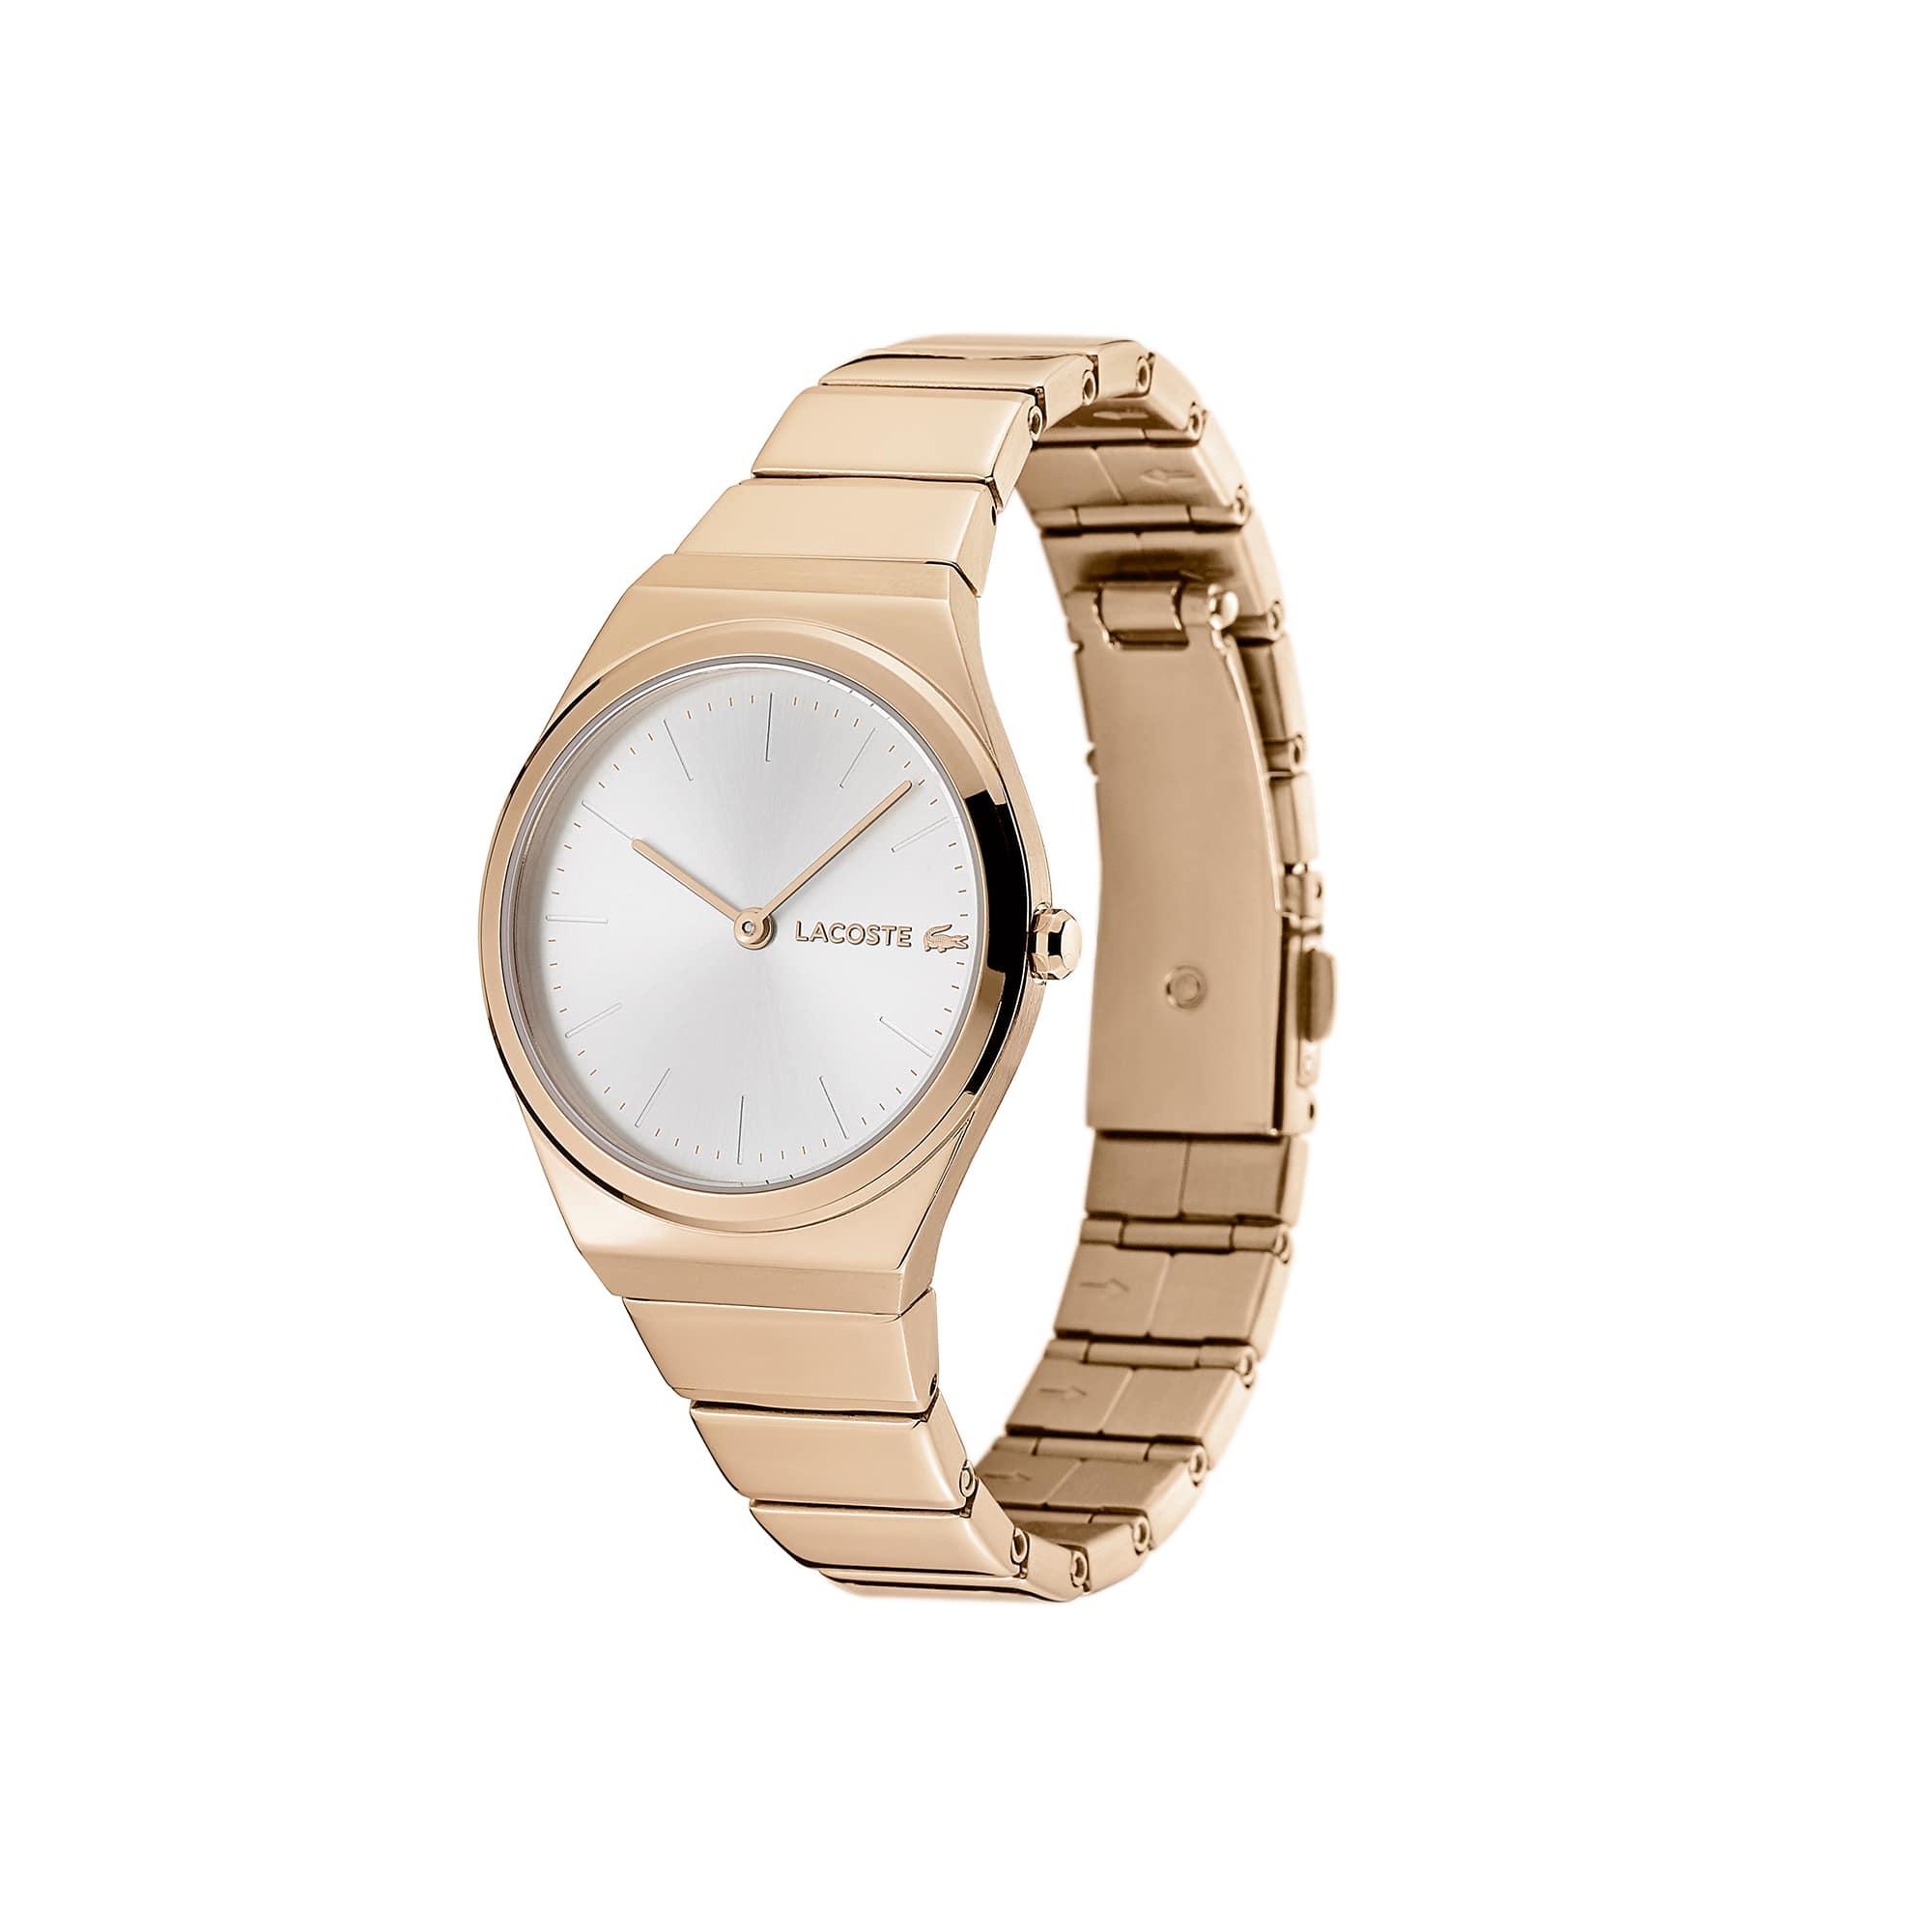 Reloj de Mujer Mia con Pulsera Chapada En Oro Rosa